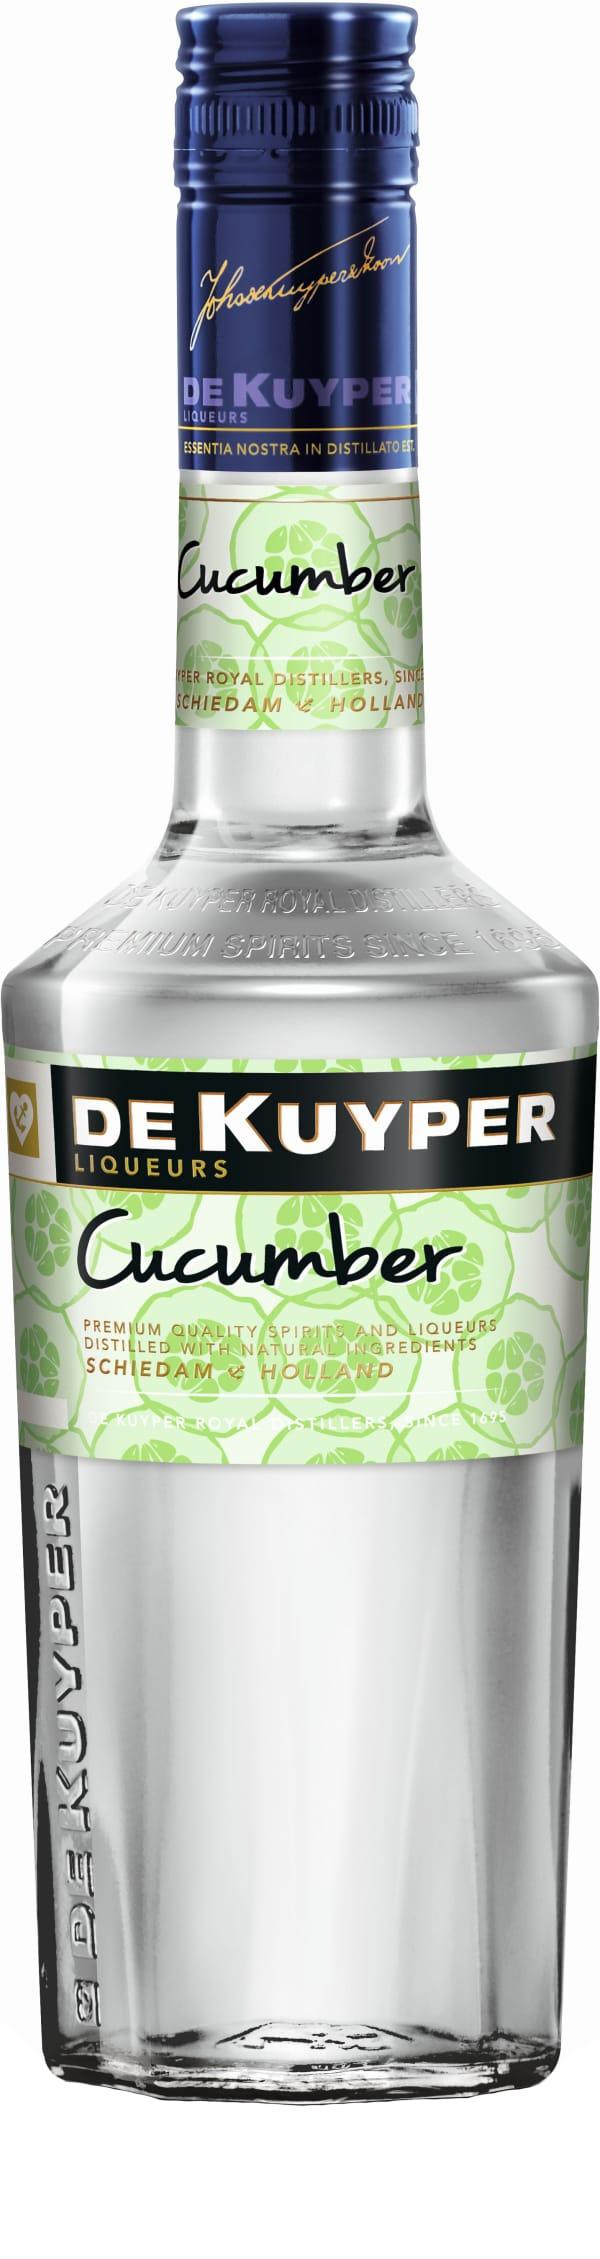 De Kuyper Cucumber